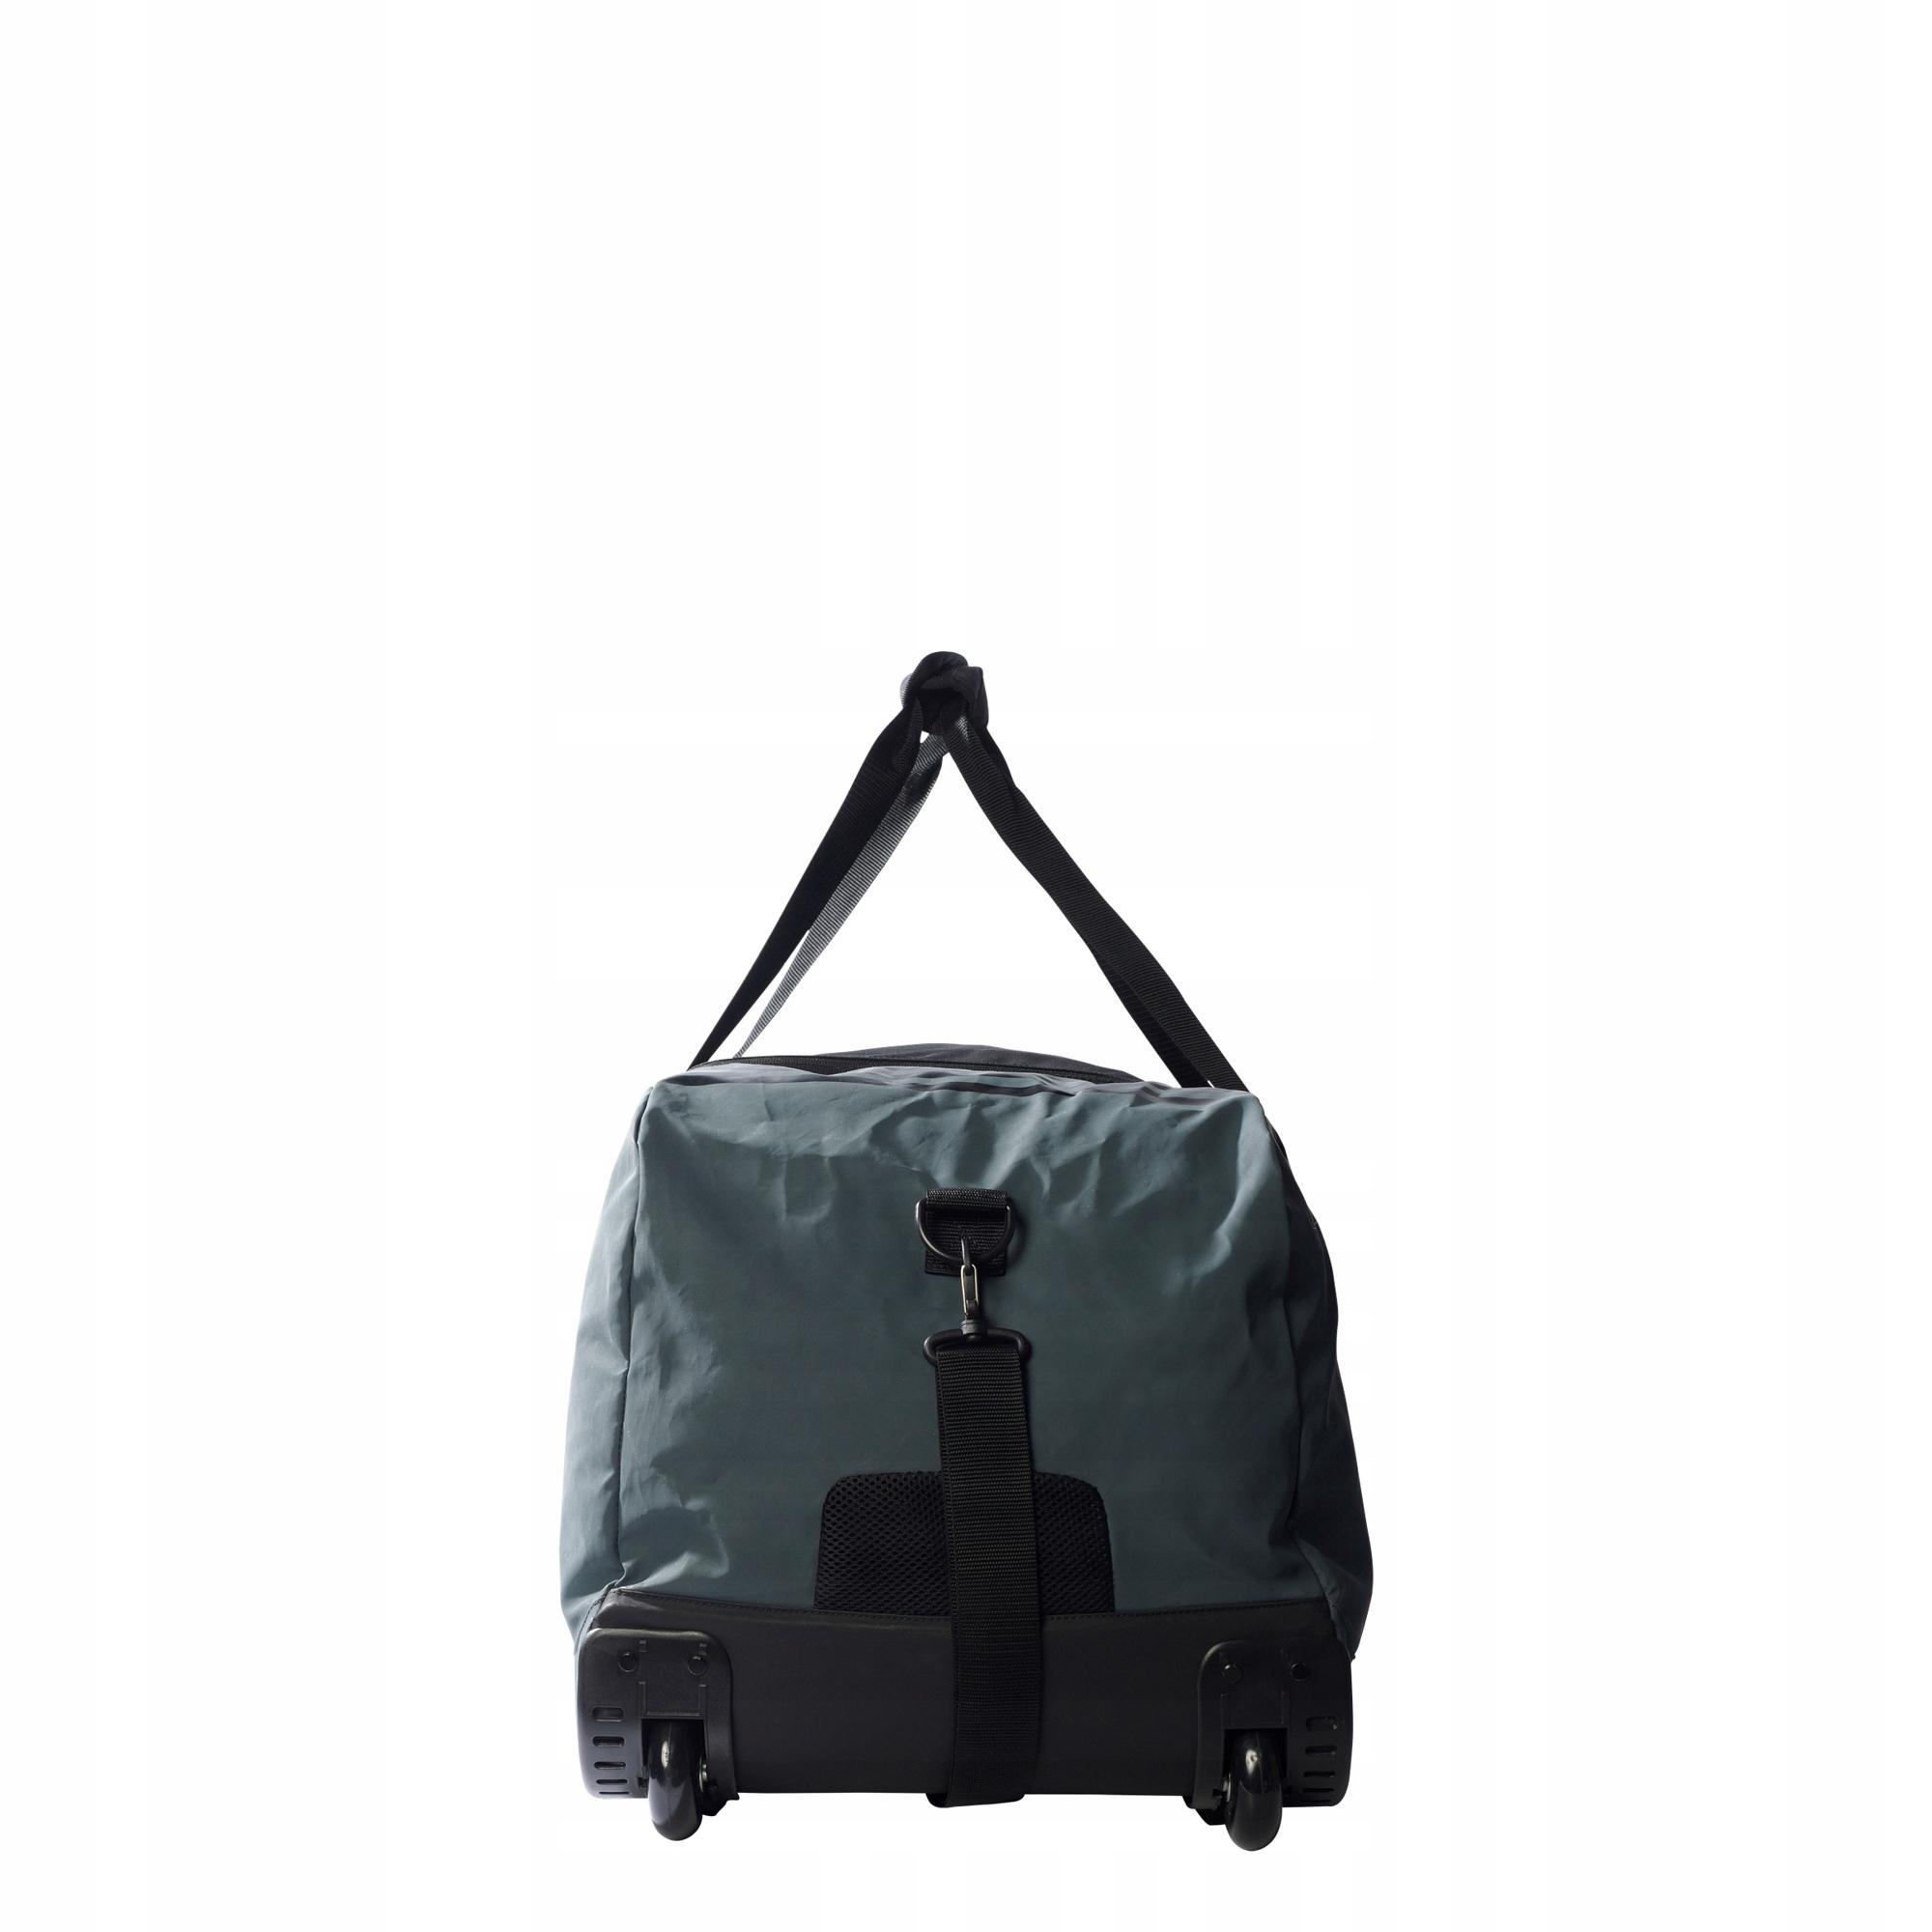 dec61e828eb47 torba sportowa na kółkach adidas r XL B46125 - 7501150646 ...